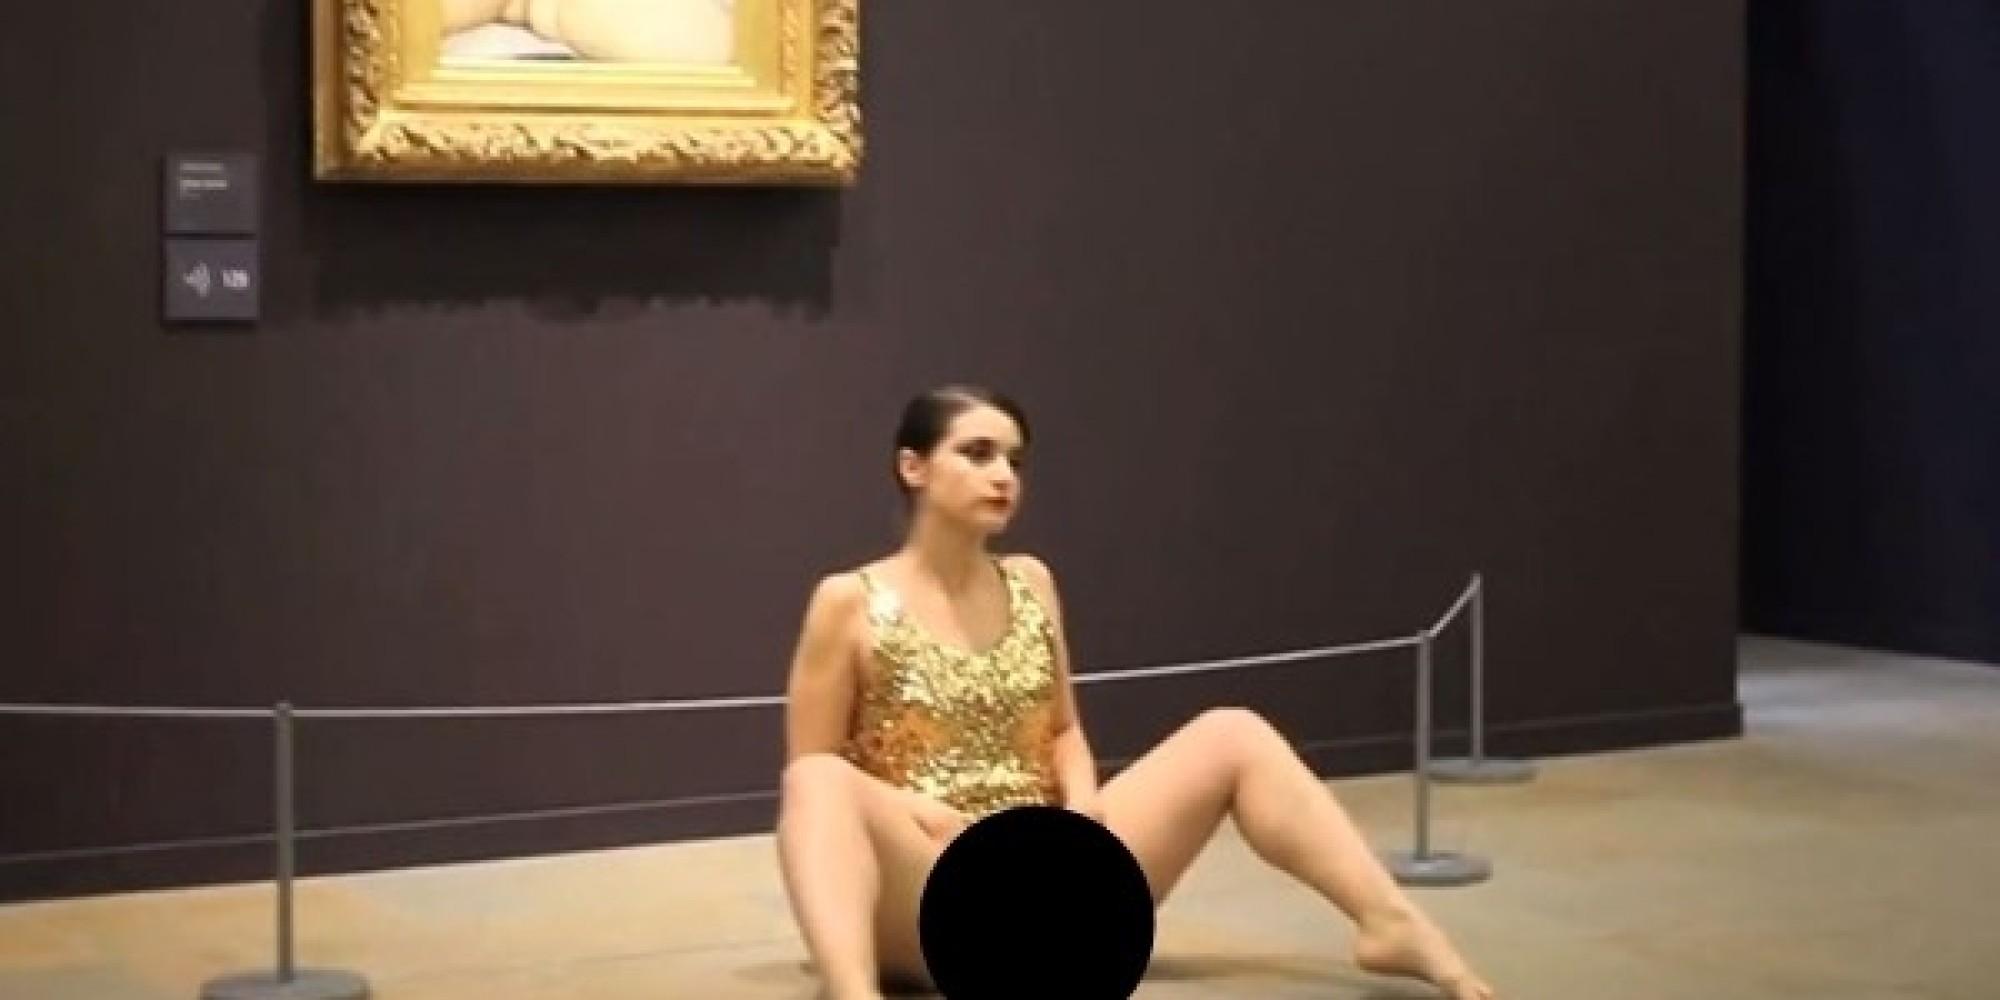 Camel nude amateur strippers in abilene texas nichole redhead